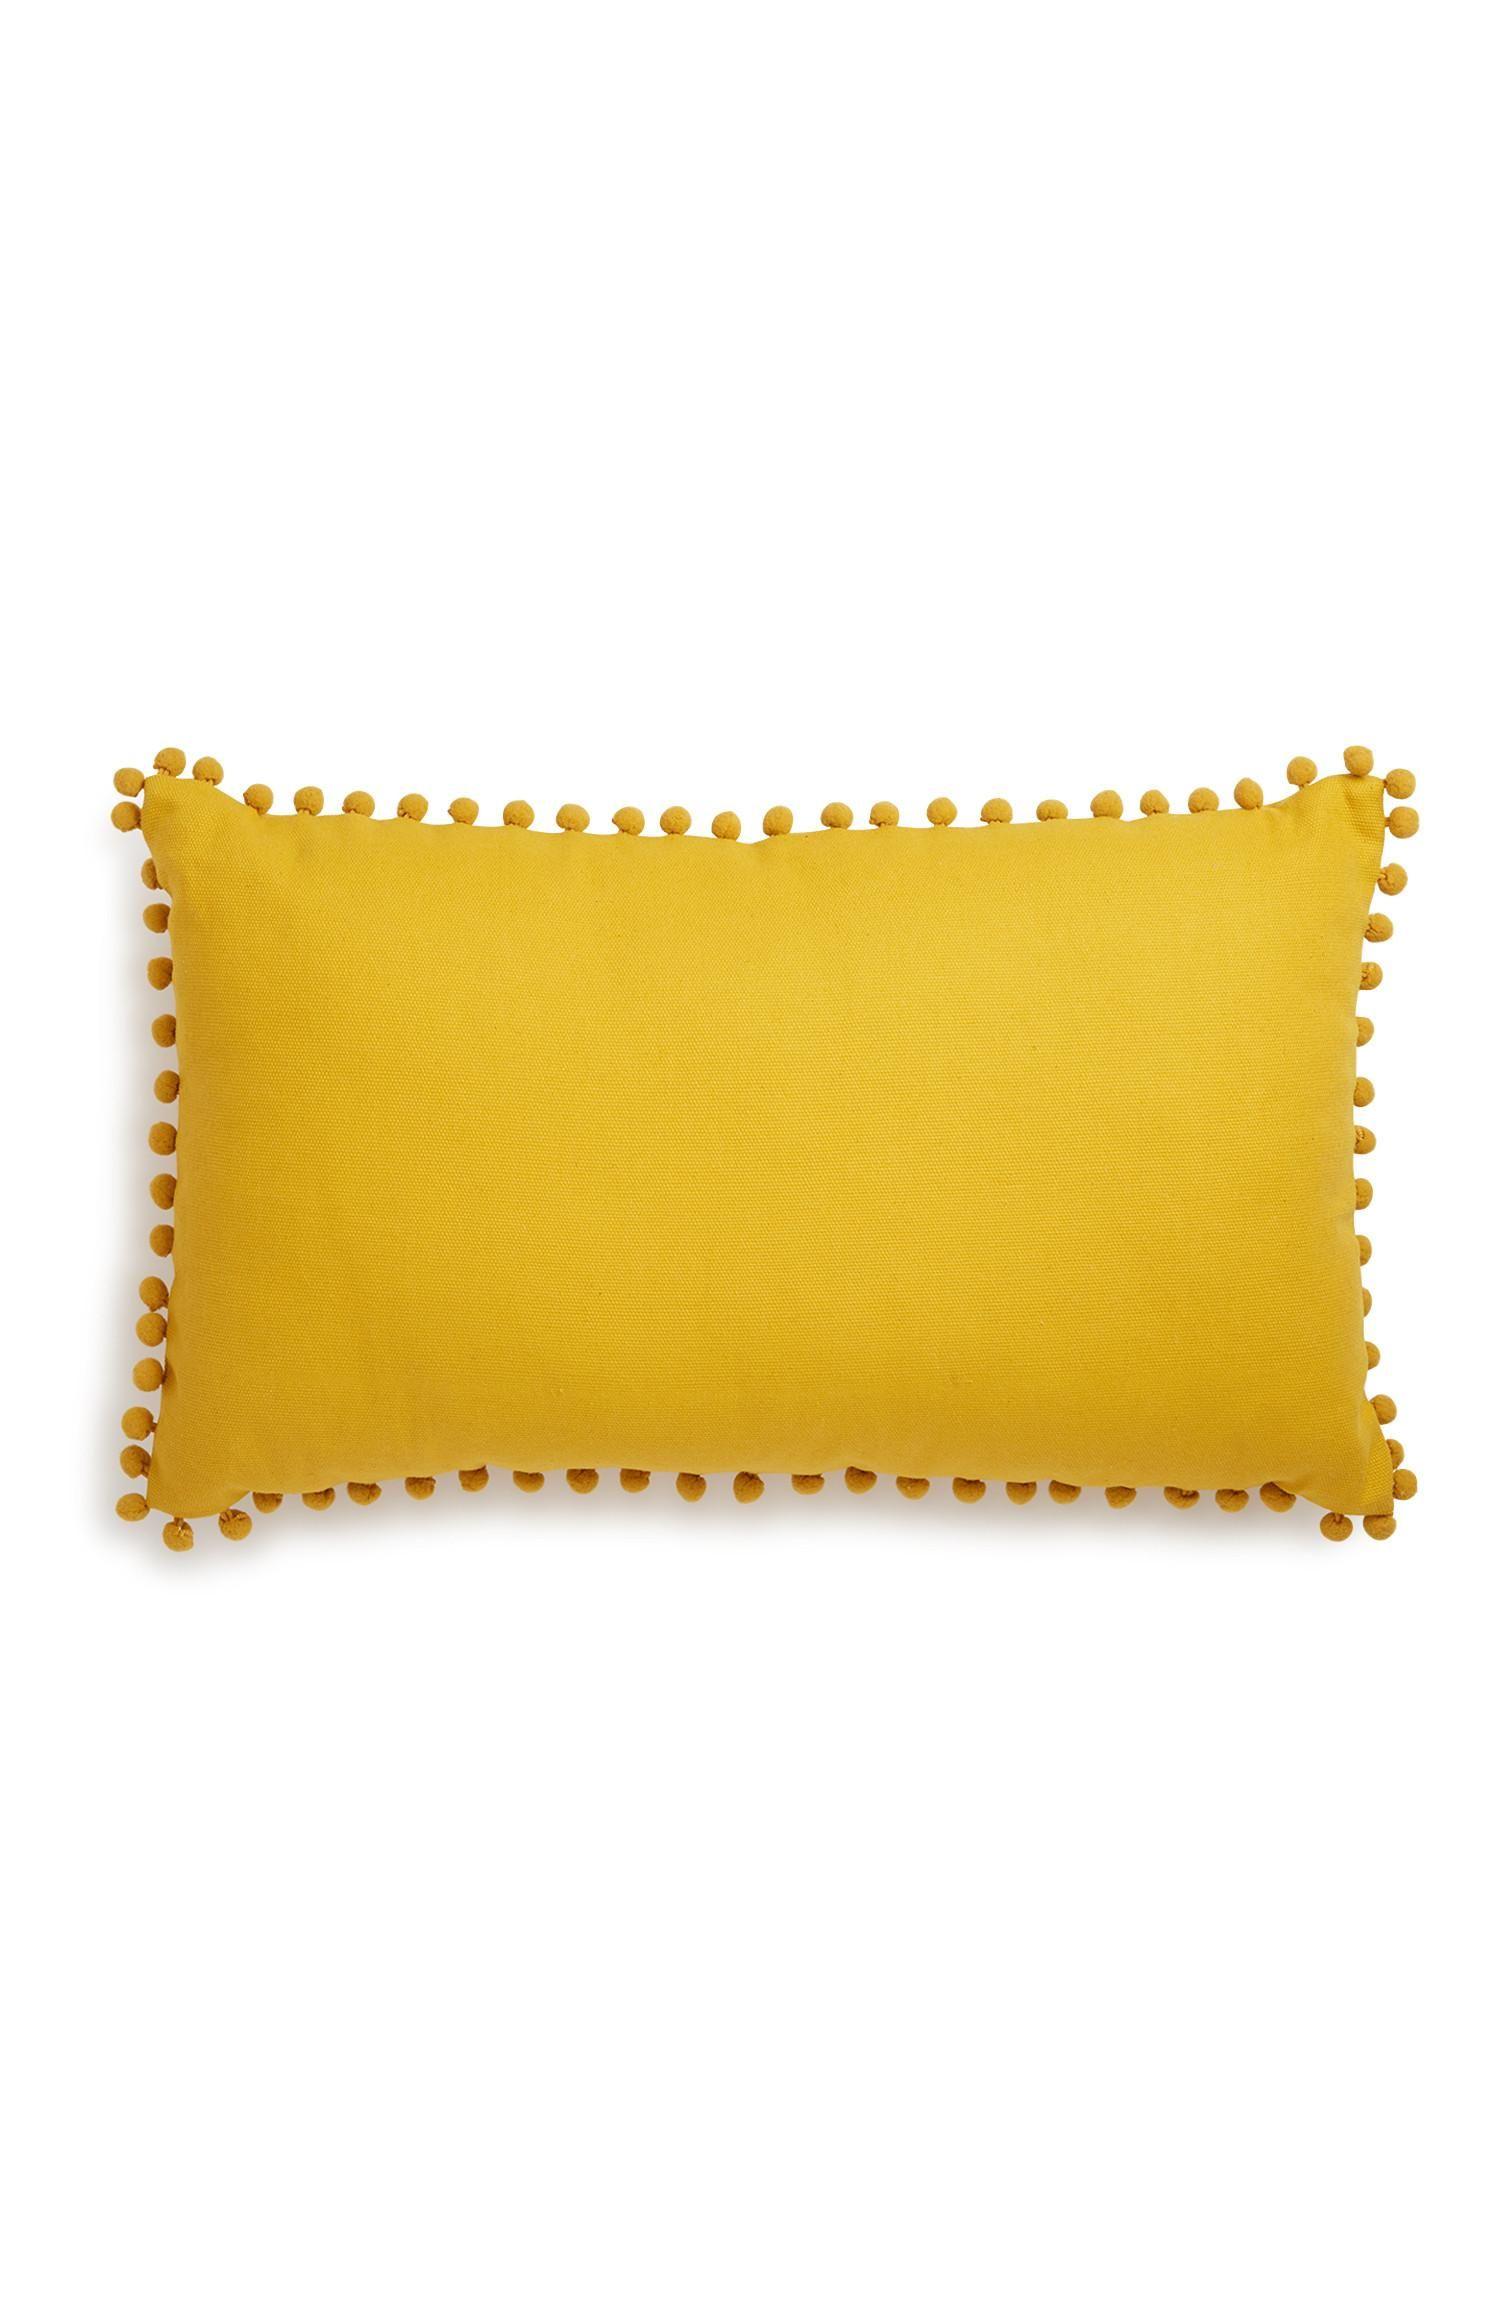 Cojines Hogar | amarillo | Kiabi